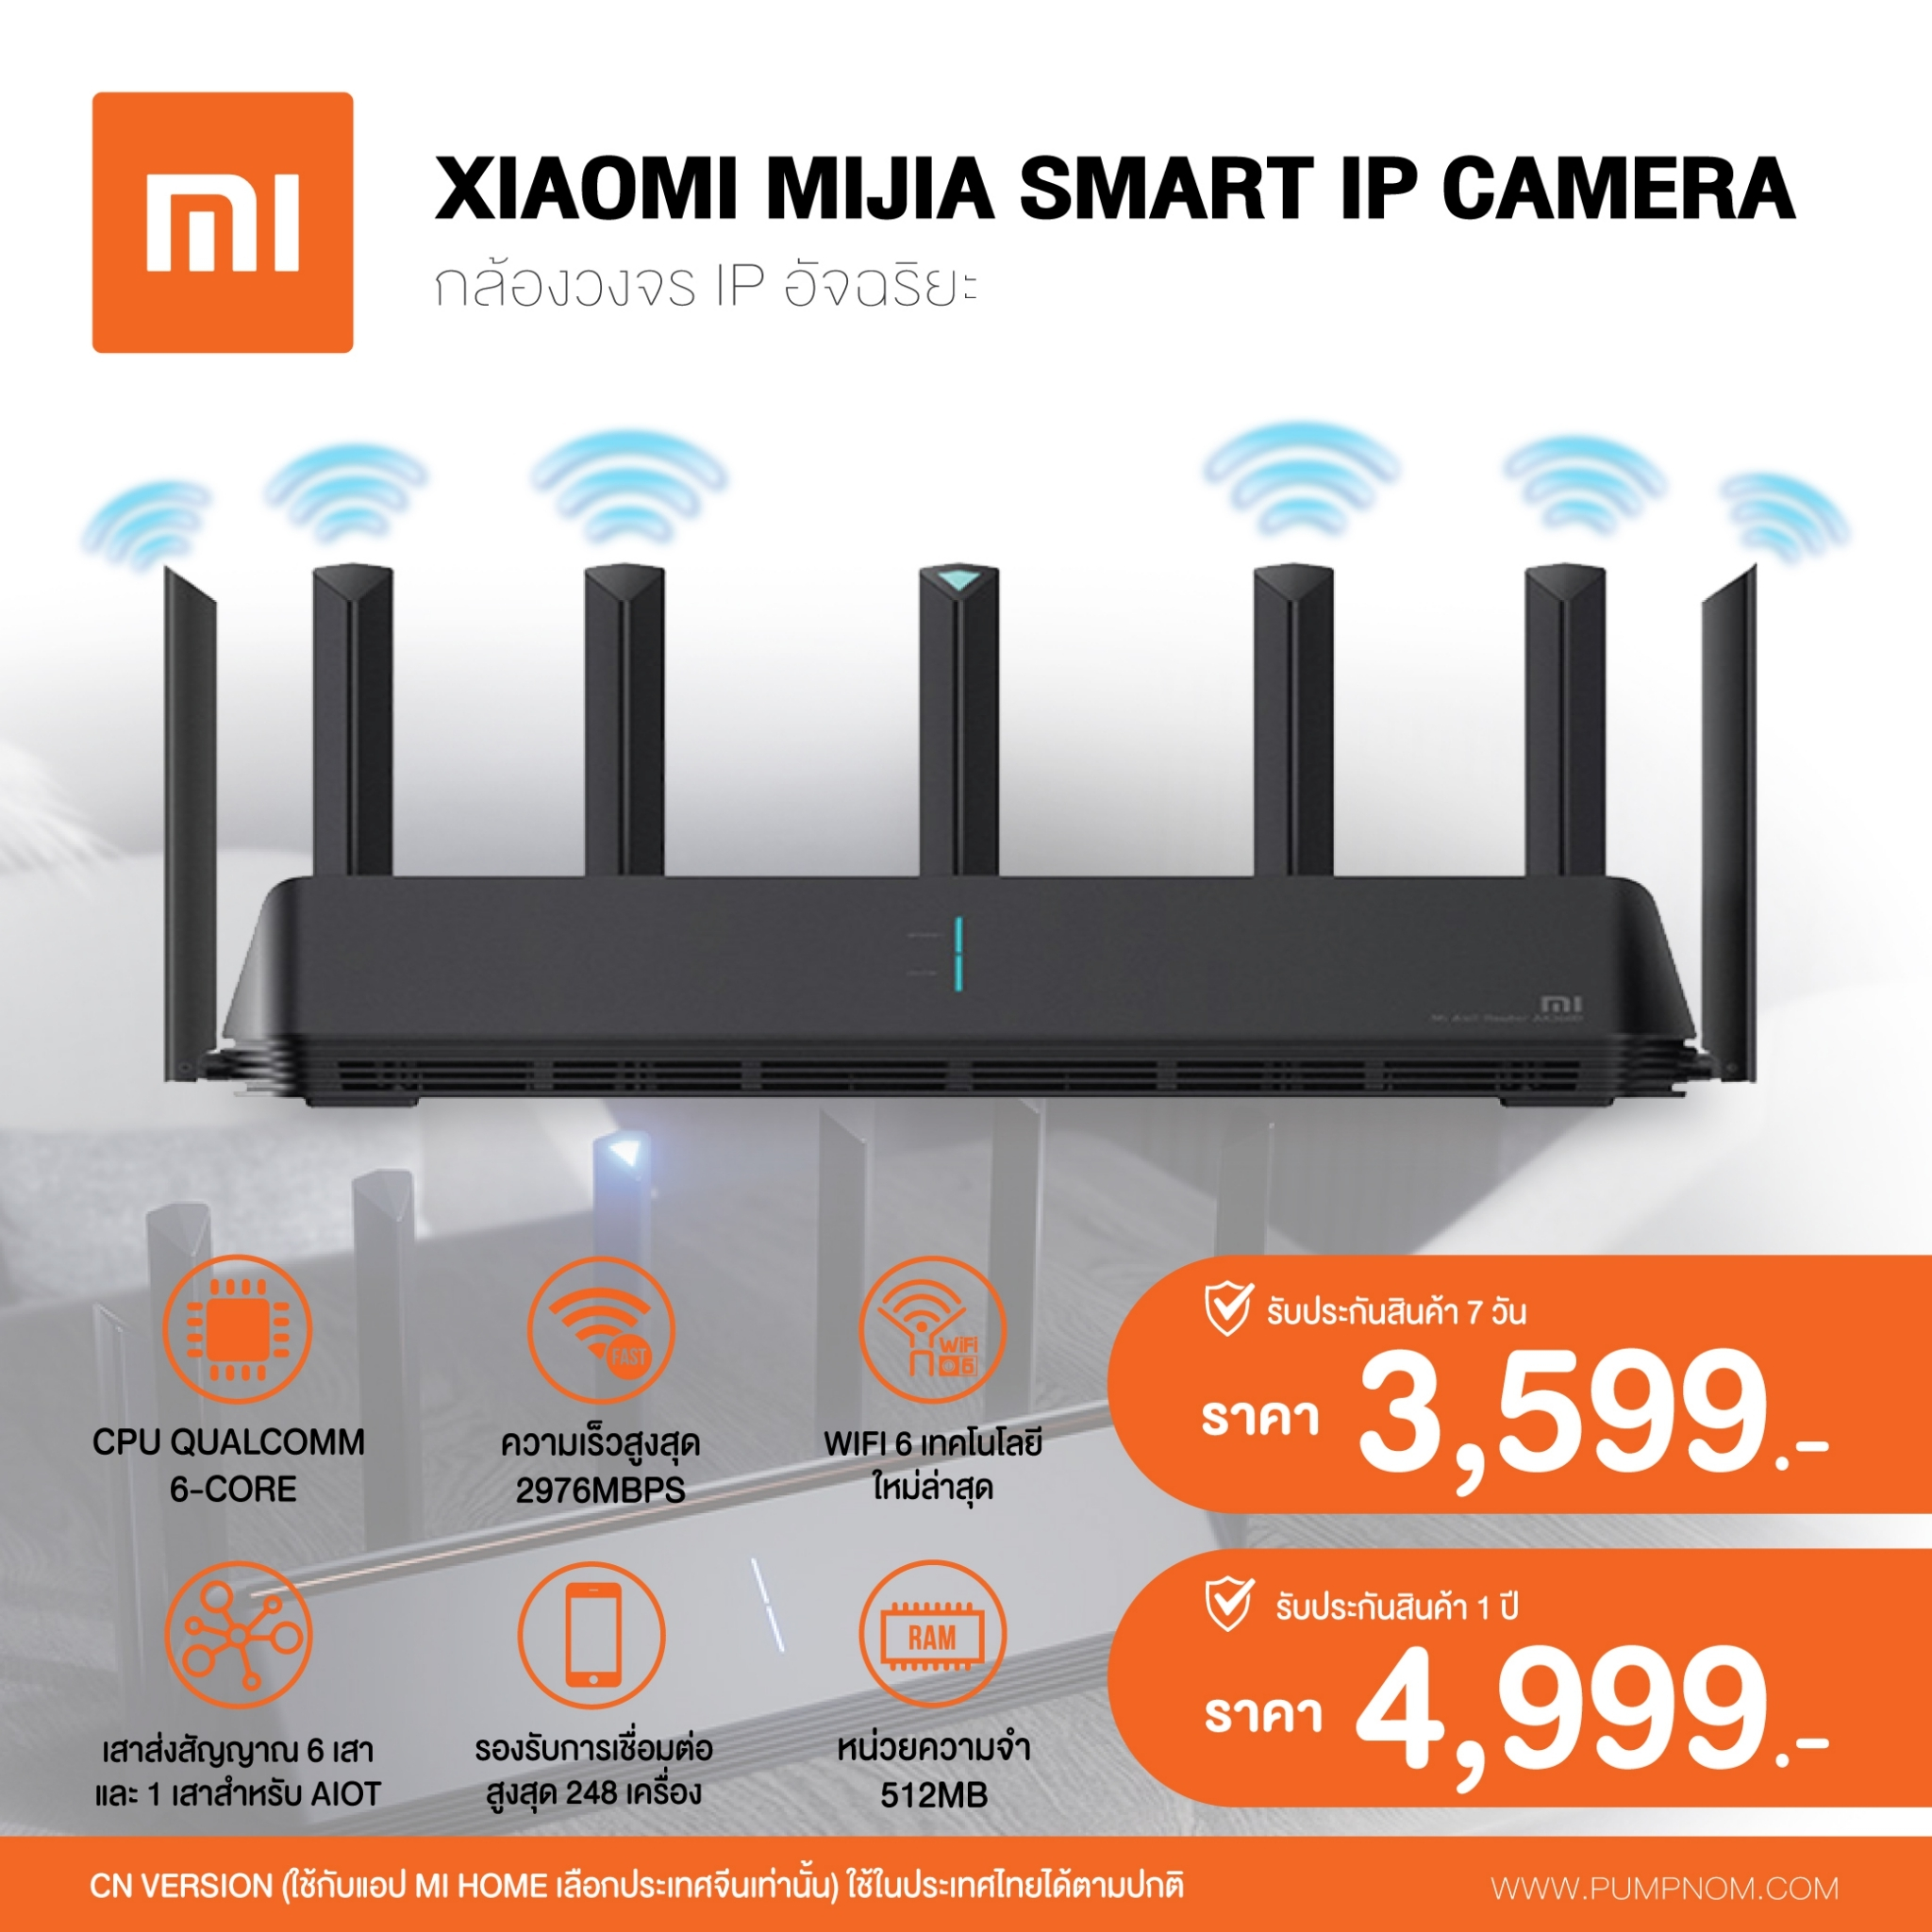 XIAOMI (เสี่ยวหมี่) Xiaomi Mi AIoT Router AX3600 เครื่องขยายสัญญาณอินเตอร์เน็ต WiFi 6 รองรับทั้งมือถือและ Smart Home ความเร็วสูงสุด 2976Mbps